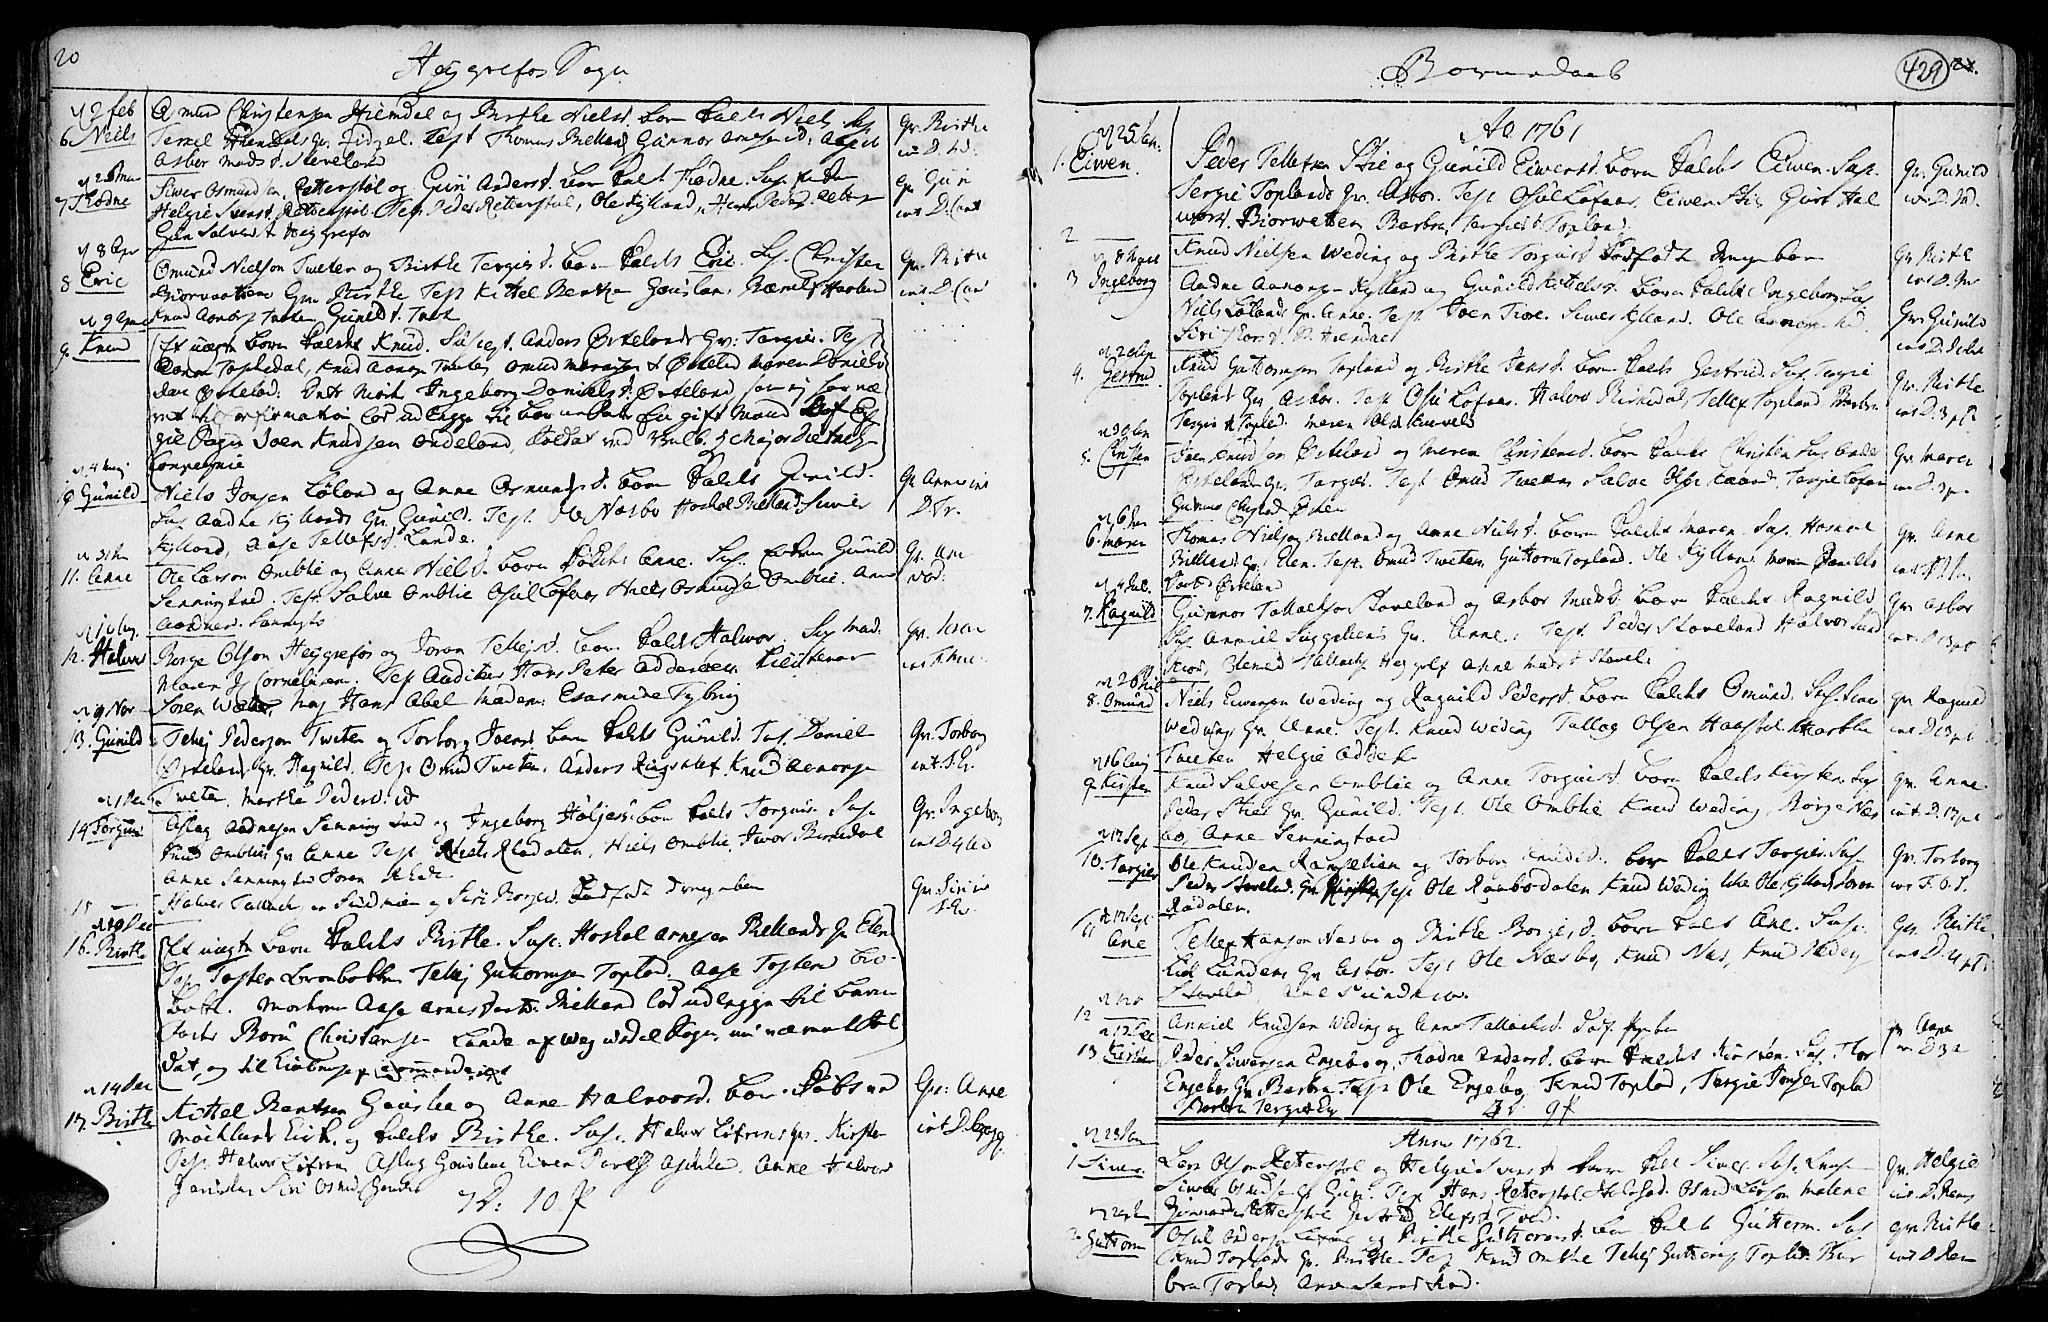 SAK, Hommedal sokneprestkontor, F/Fa/Fab/L0002: Ministerialbok nr. A 2 /3, 1740-1821, s. 429